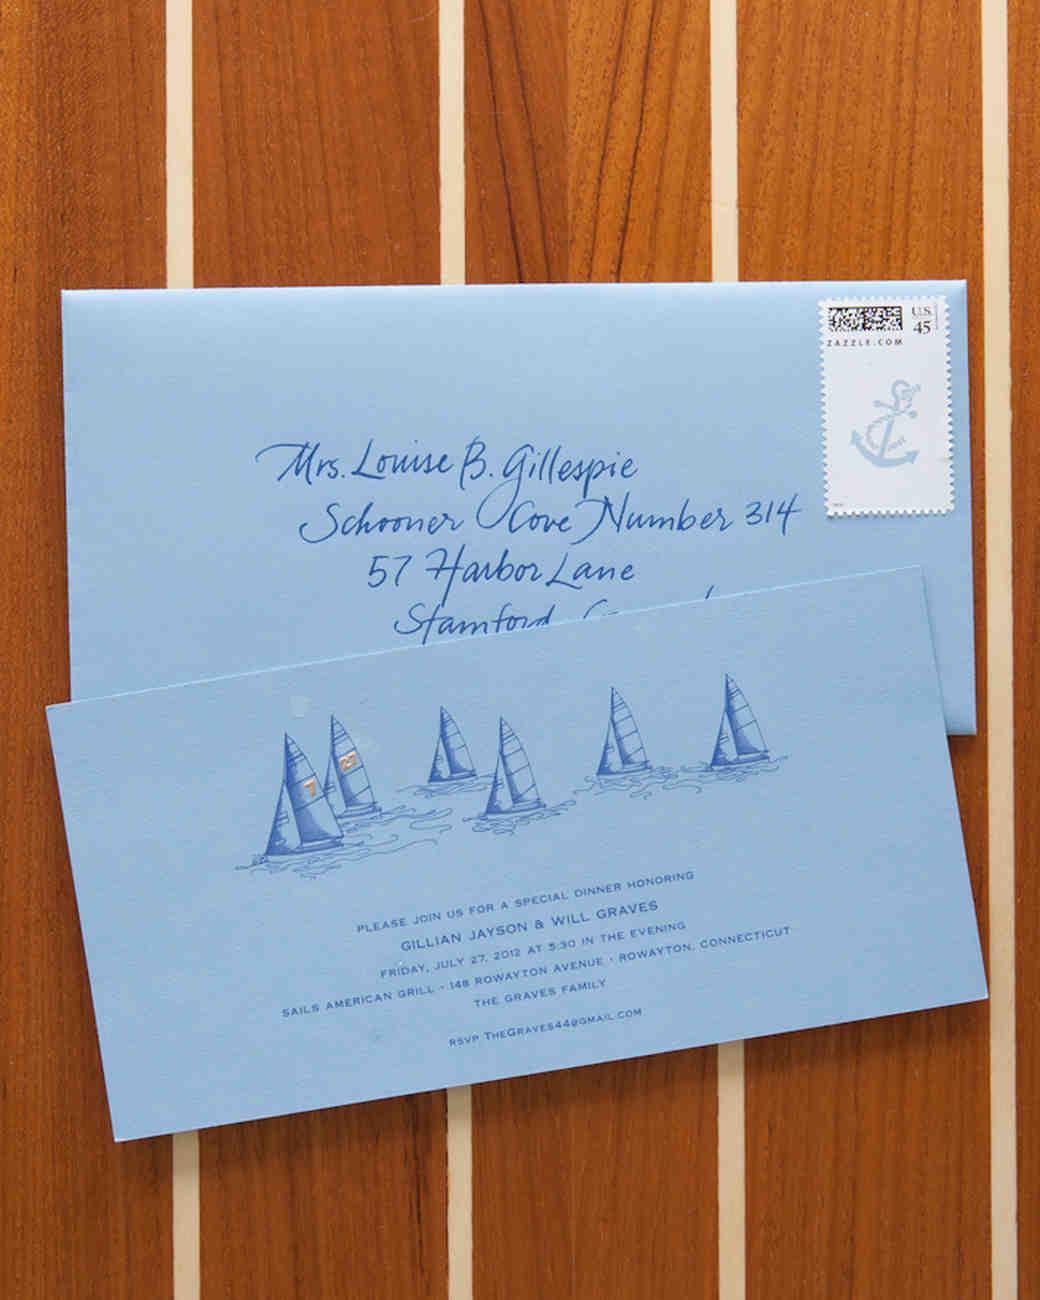 Nautical Wedding Invitations Perfect For An Oceanside Celebration | Martha  Stewart Weddings